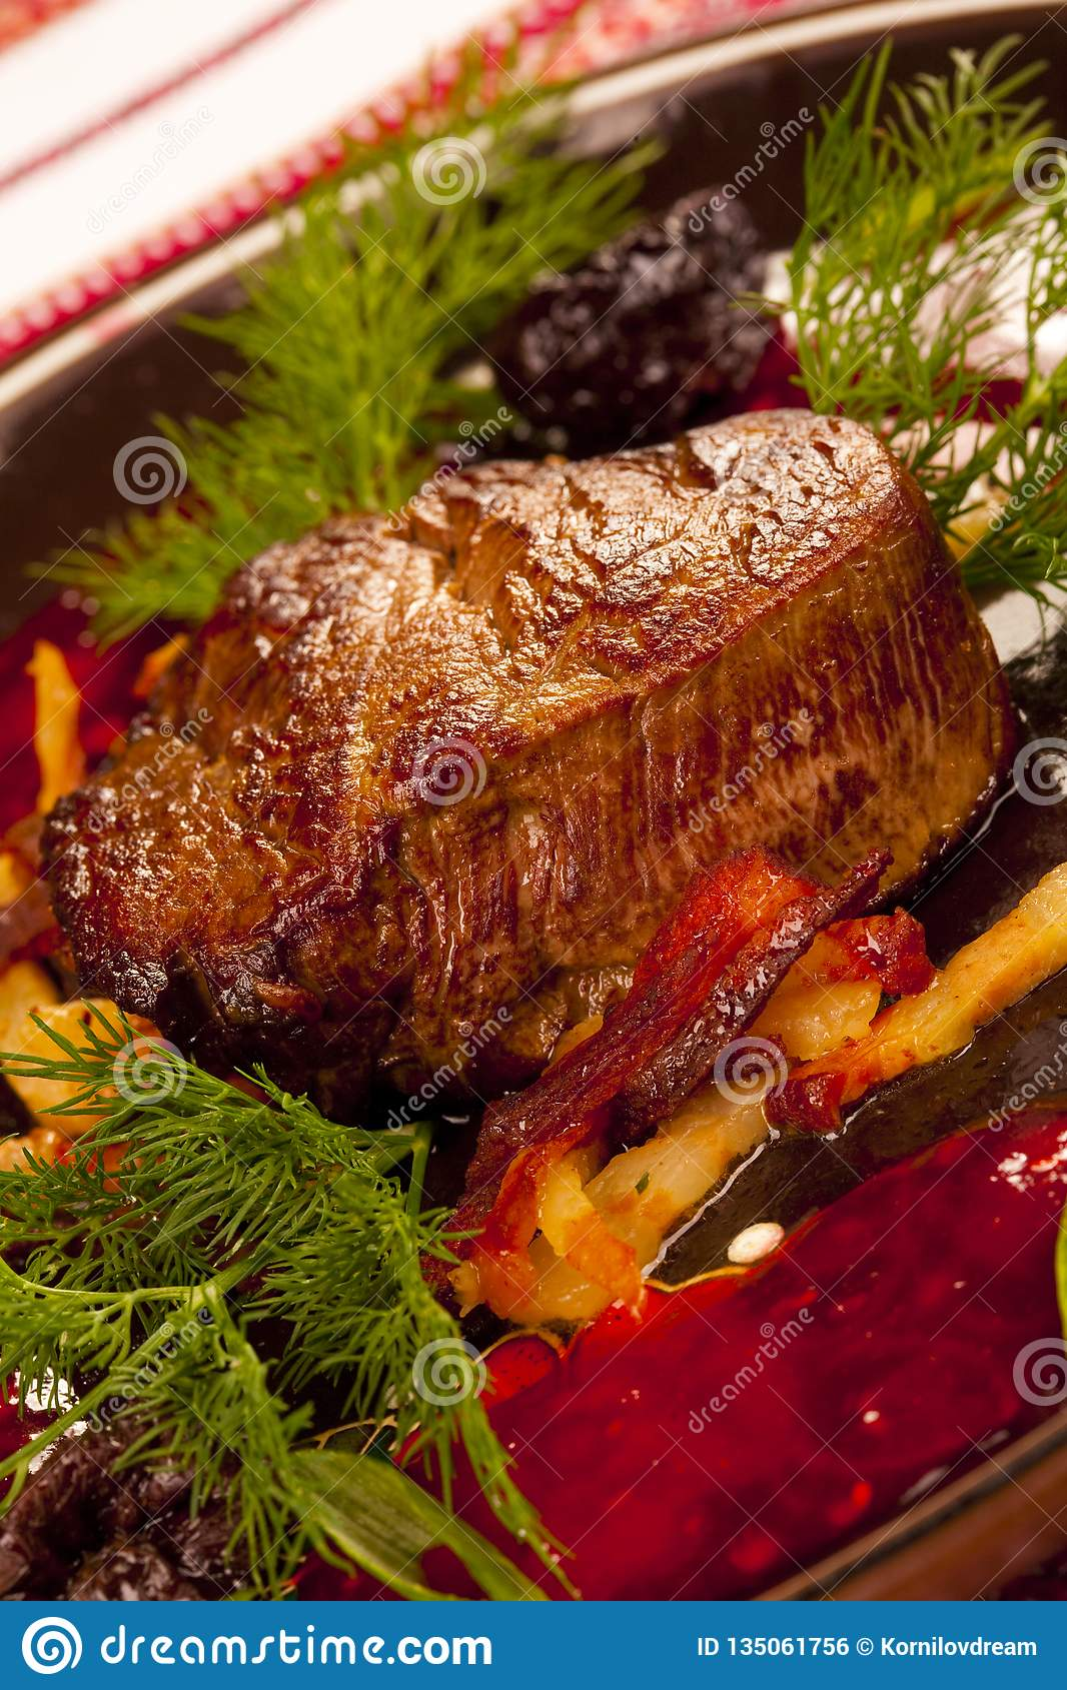 Steak meat grilled